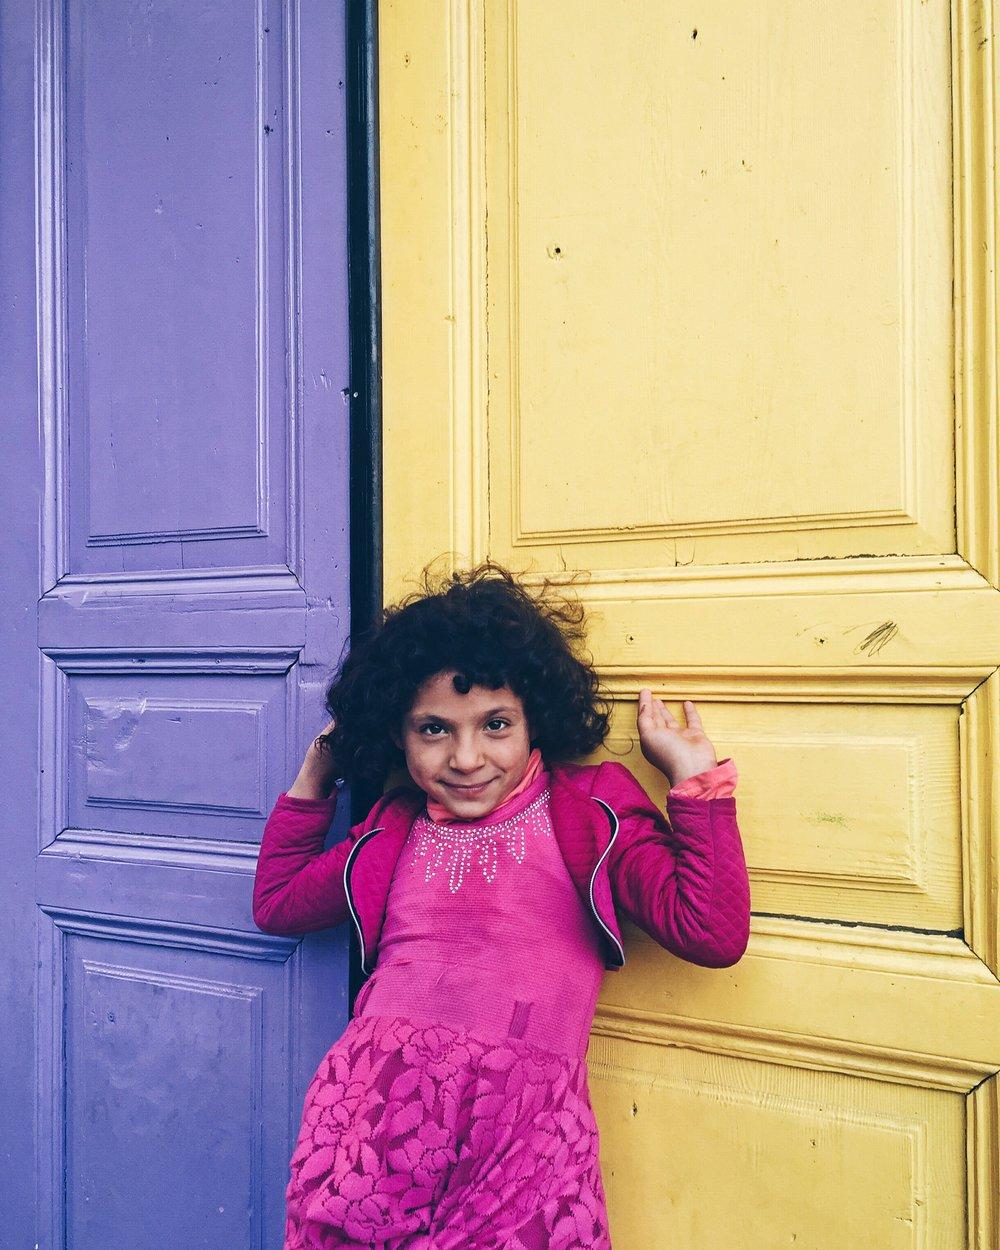 Photogenic girl - colorful